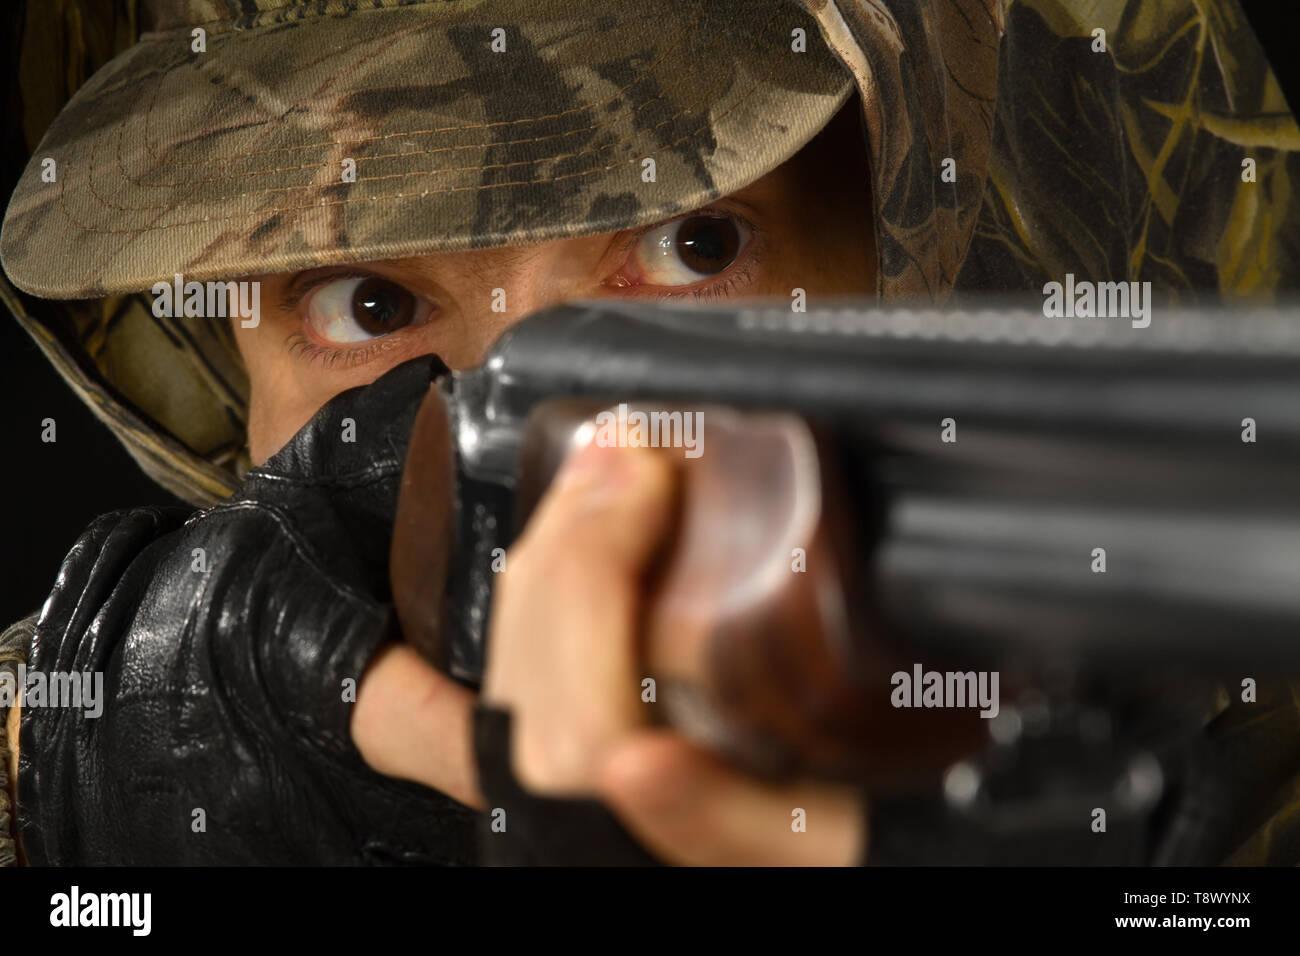 the face of a hunter aiming a shotgun, closeup - Stock Image